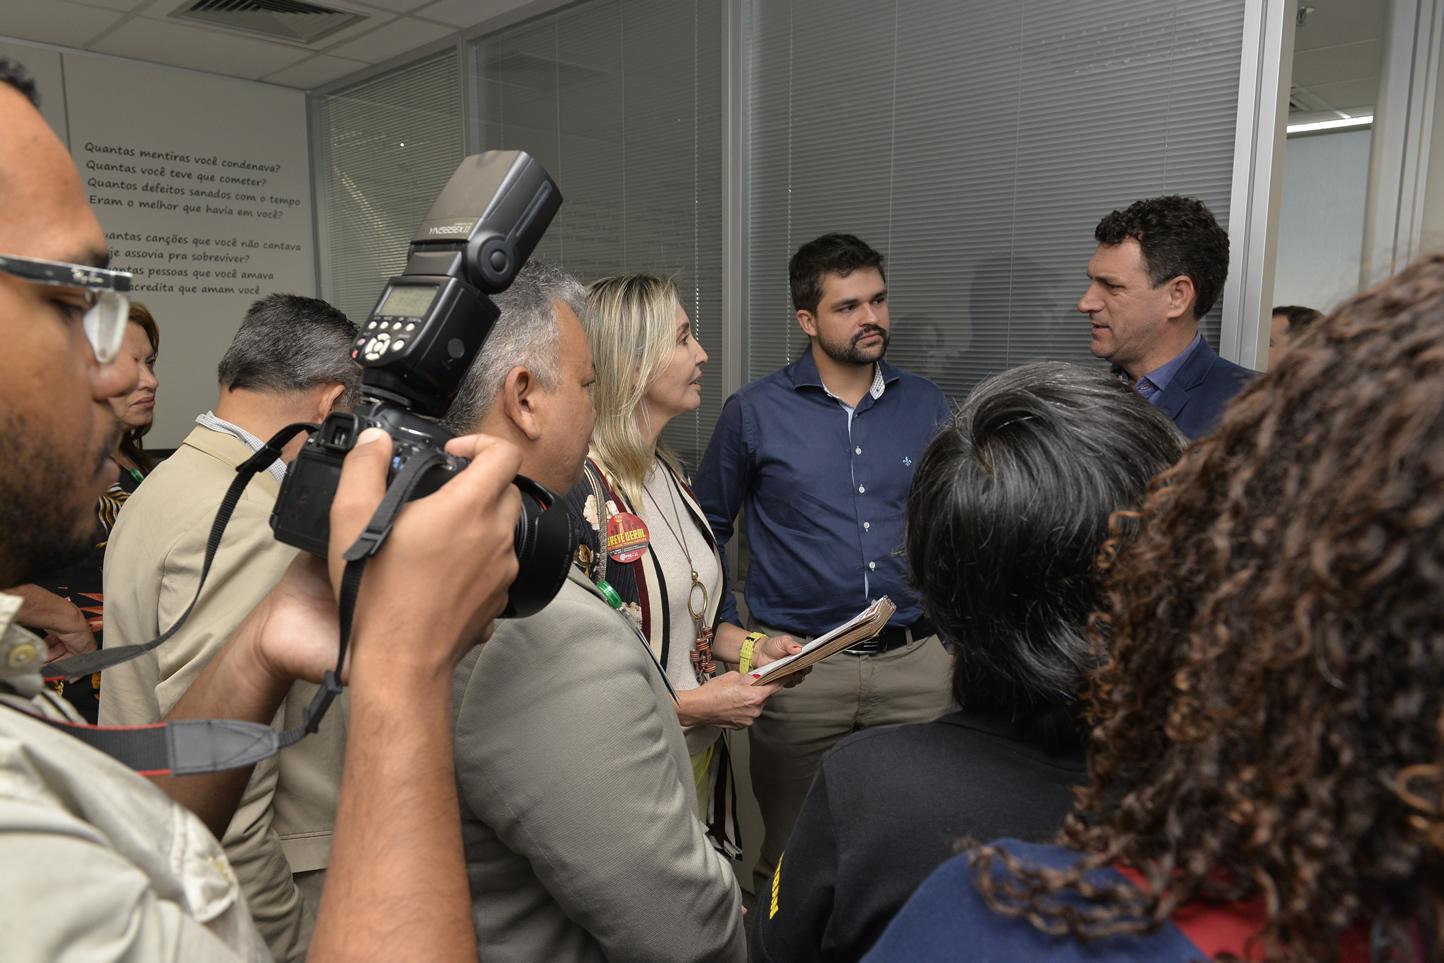 2019.06.13_Visita-aos-gabinetes-contra-o-fim-da-licenca-premio_fotos-Deva-Garcia-23